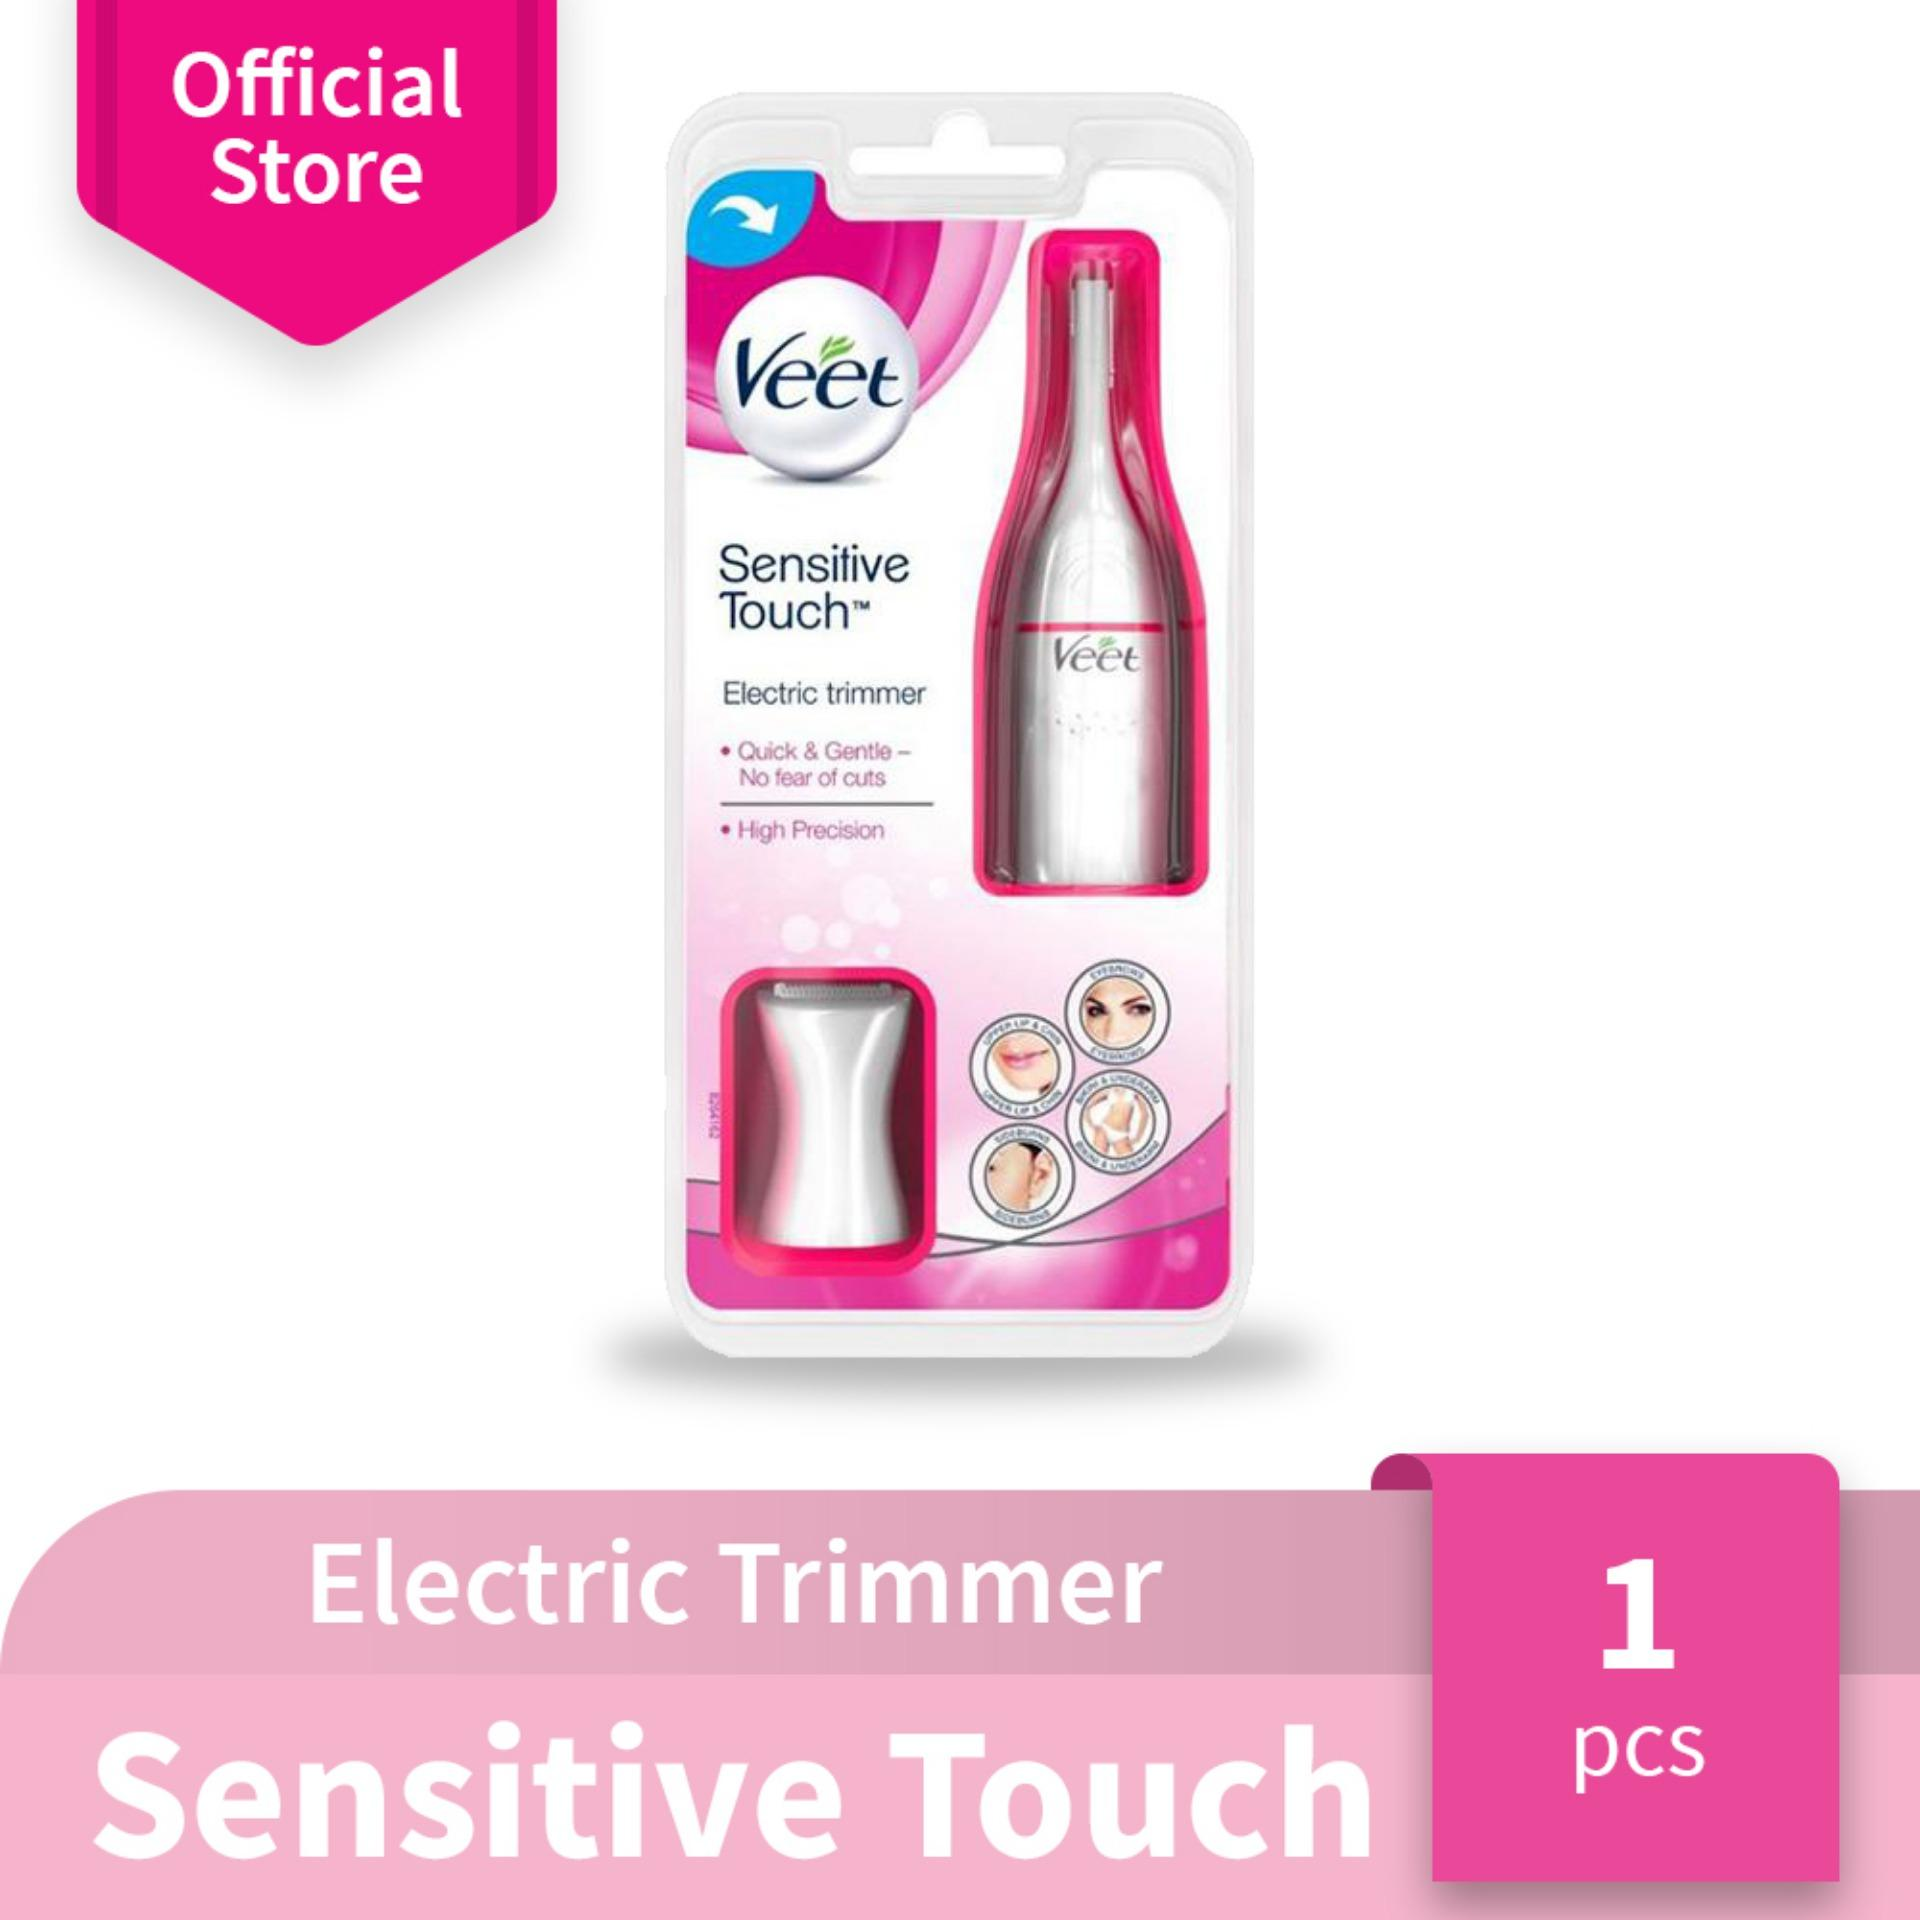 Veet Sensitive Touch Electric Trimmer - Penghilang Bulu   Pencukur Bulu 5bd1360022